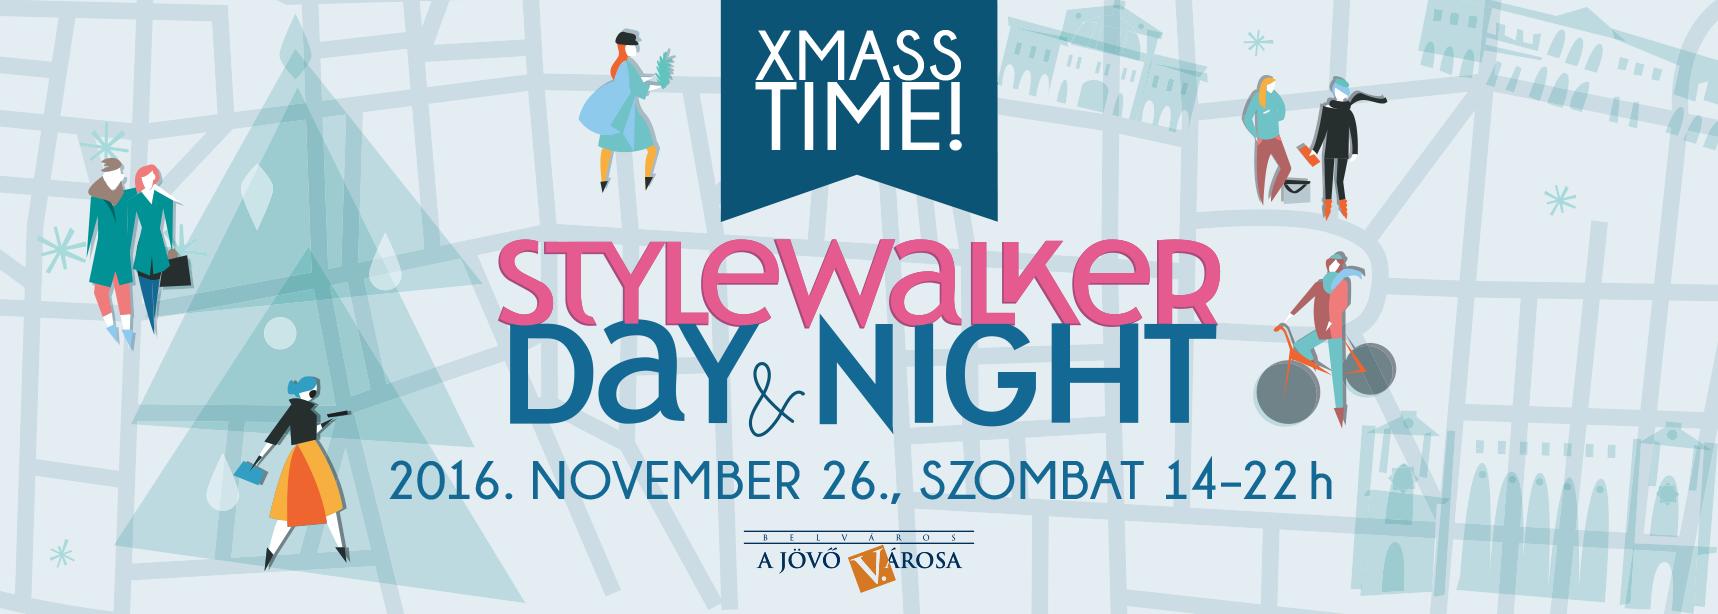 Stlywalker Day&Night: Középpontban a tudatosság!